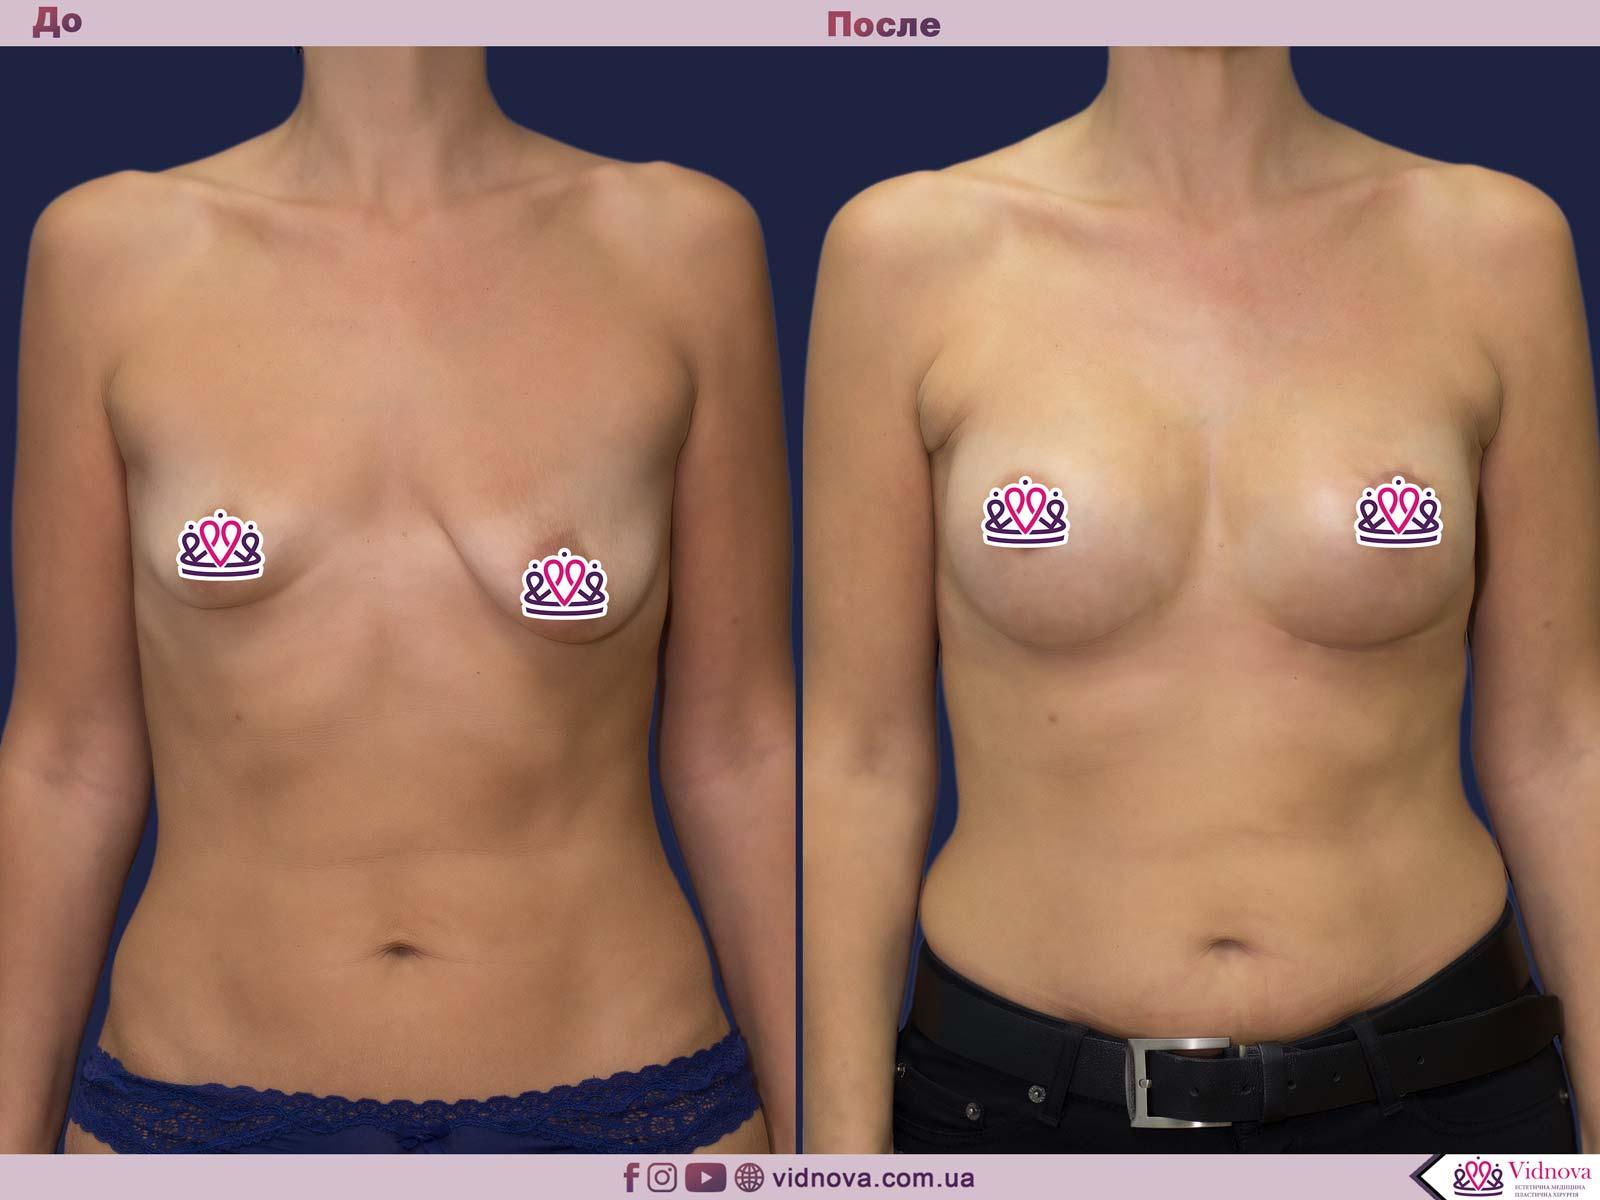 Увеличение груди: Фото ДО и ПОСЛЕ - Пример №68-1 - Клиника Vidnova